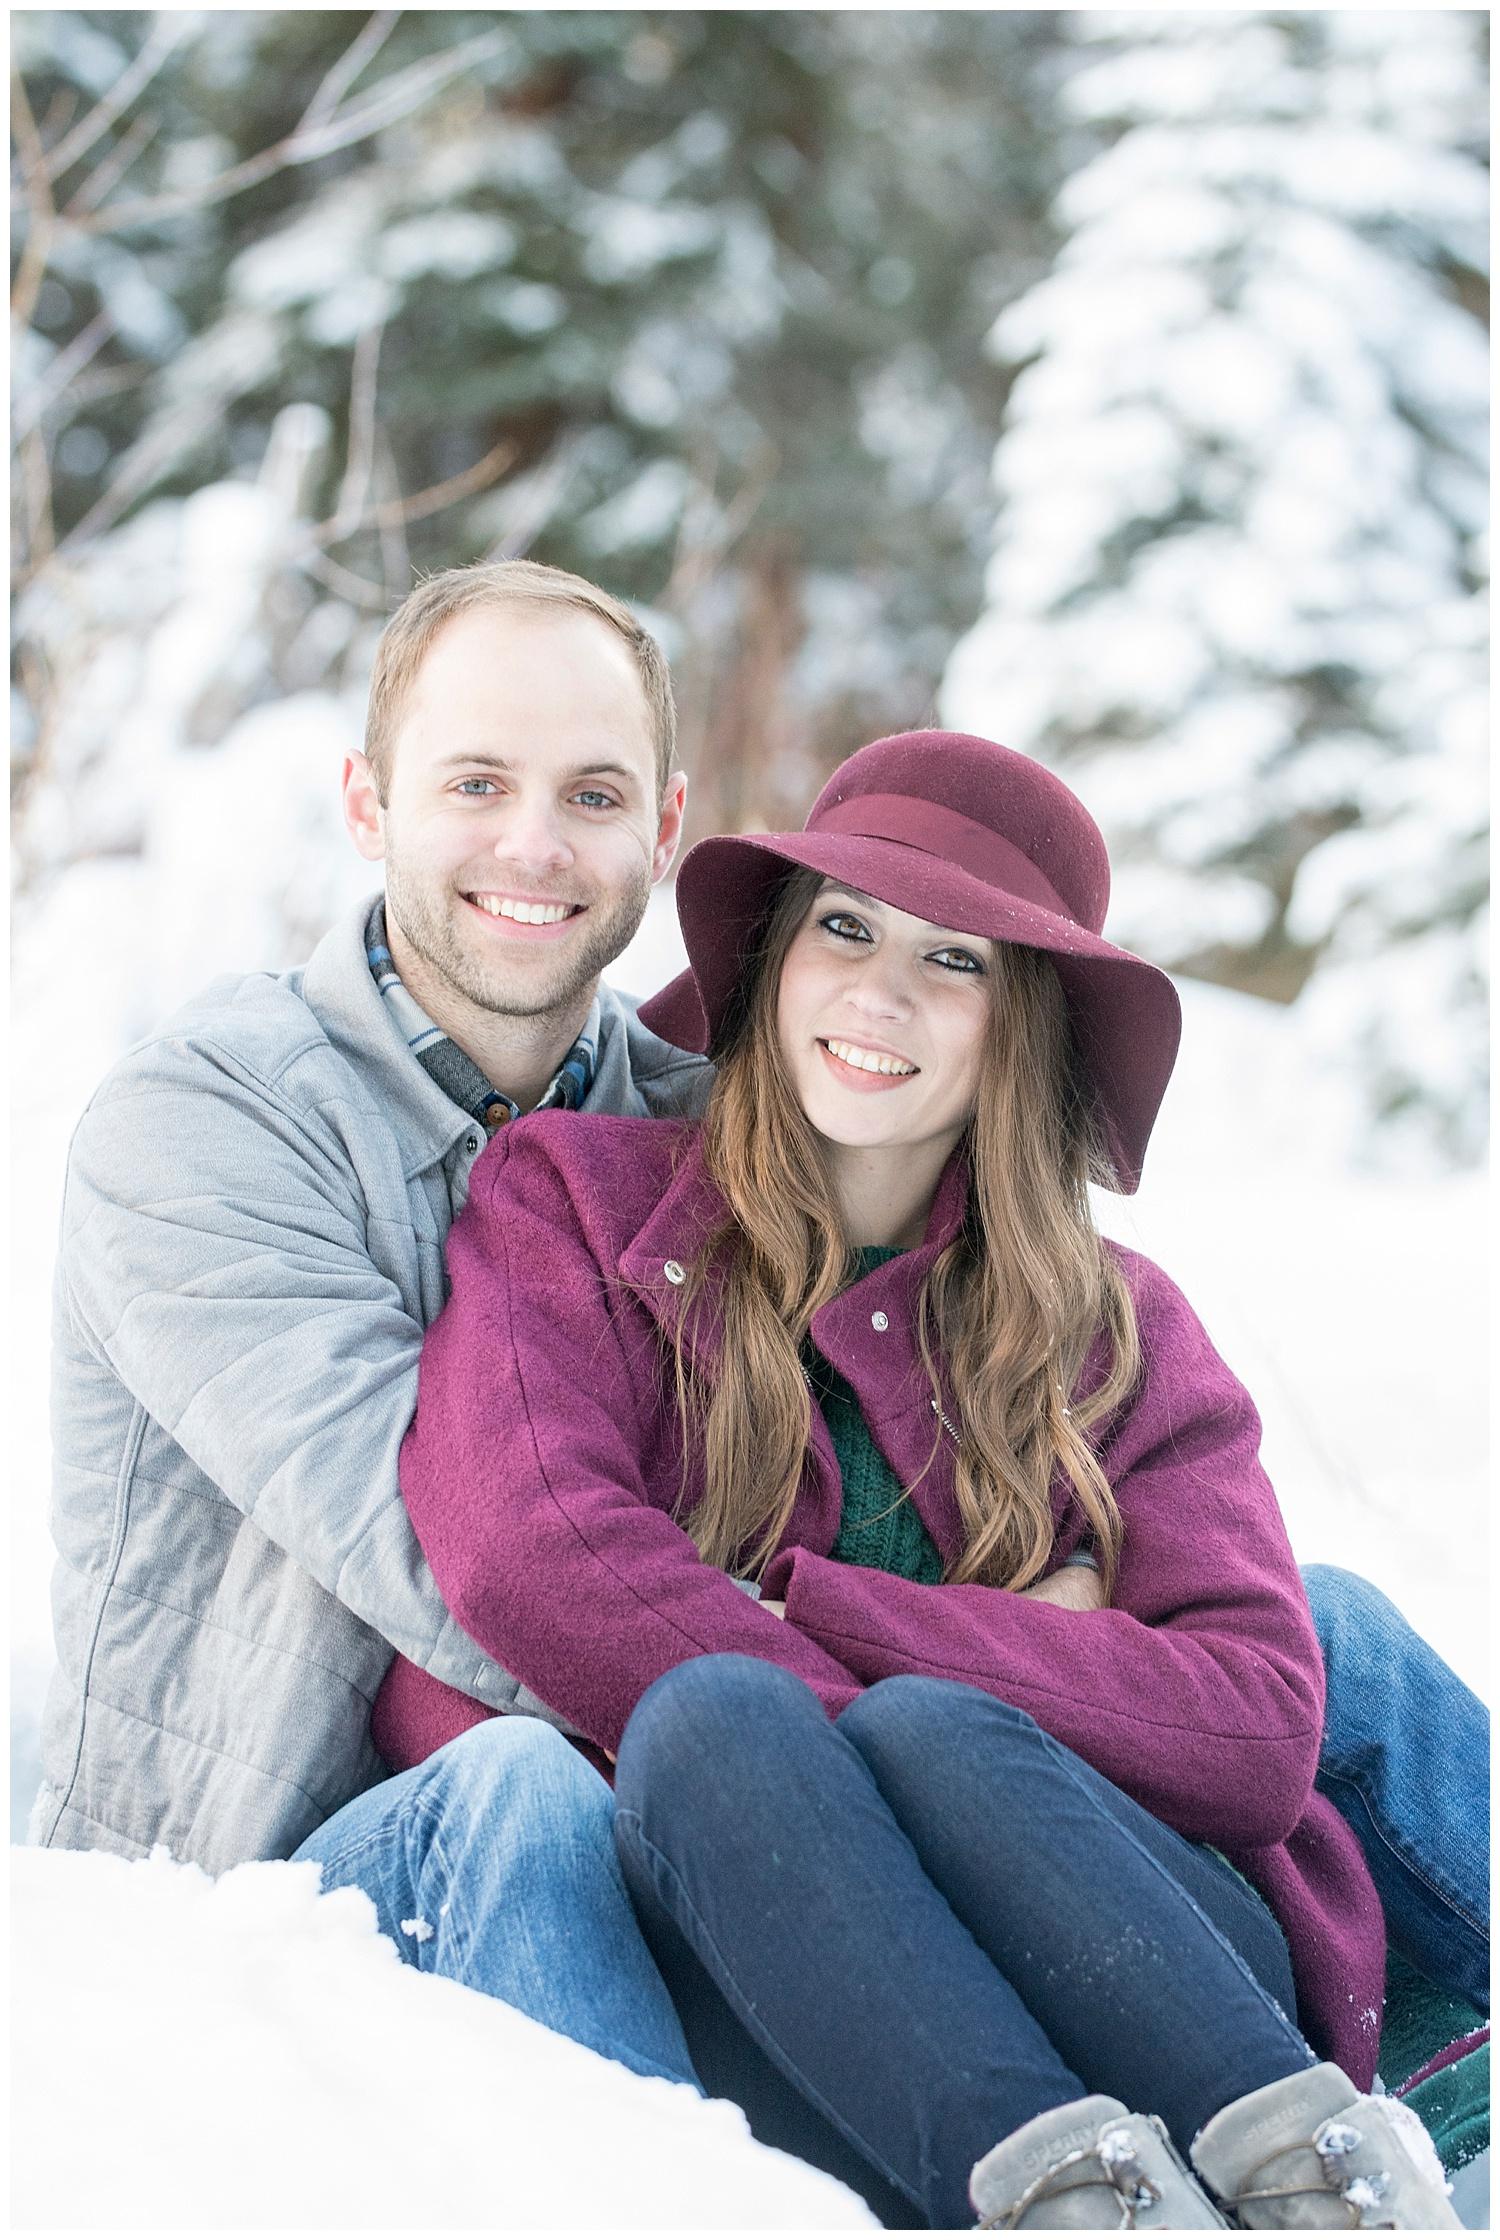 Breckenridge_Colorado_Engagement_Photographer_Ski_Resort_Mountain_Town_Photography_Engagement_Photos_009.jpg